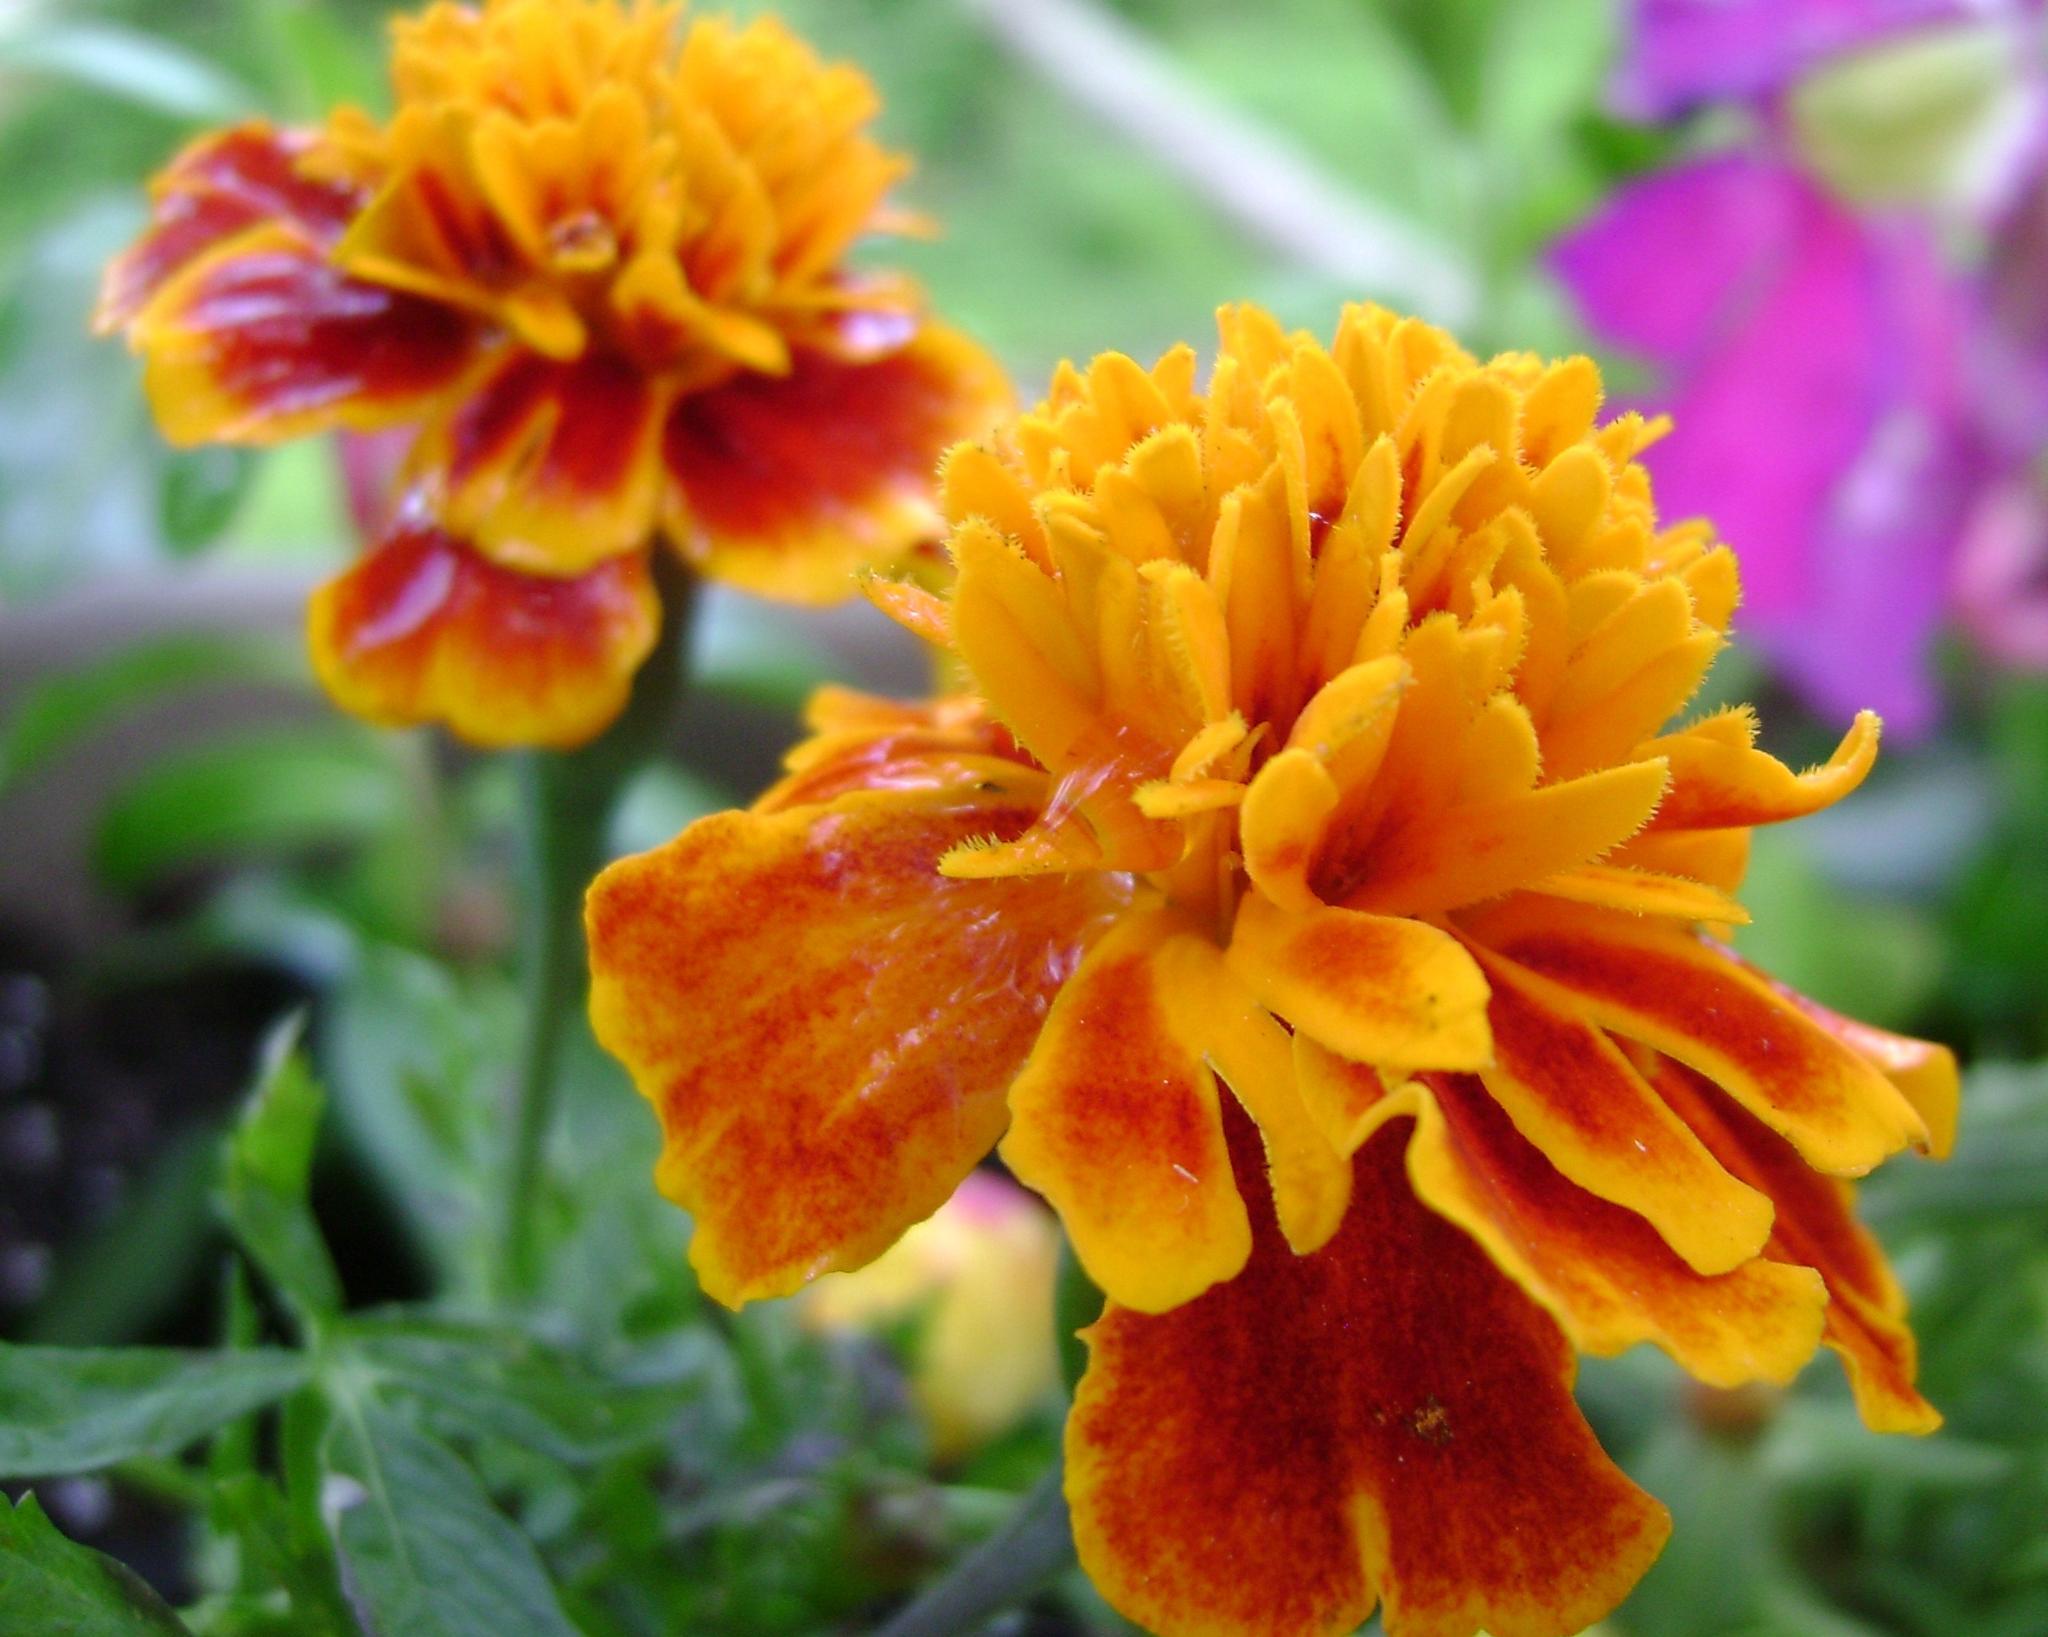 Marigolds with Spring Dew by angela.hatchett.161